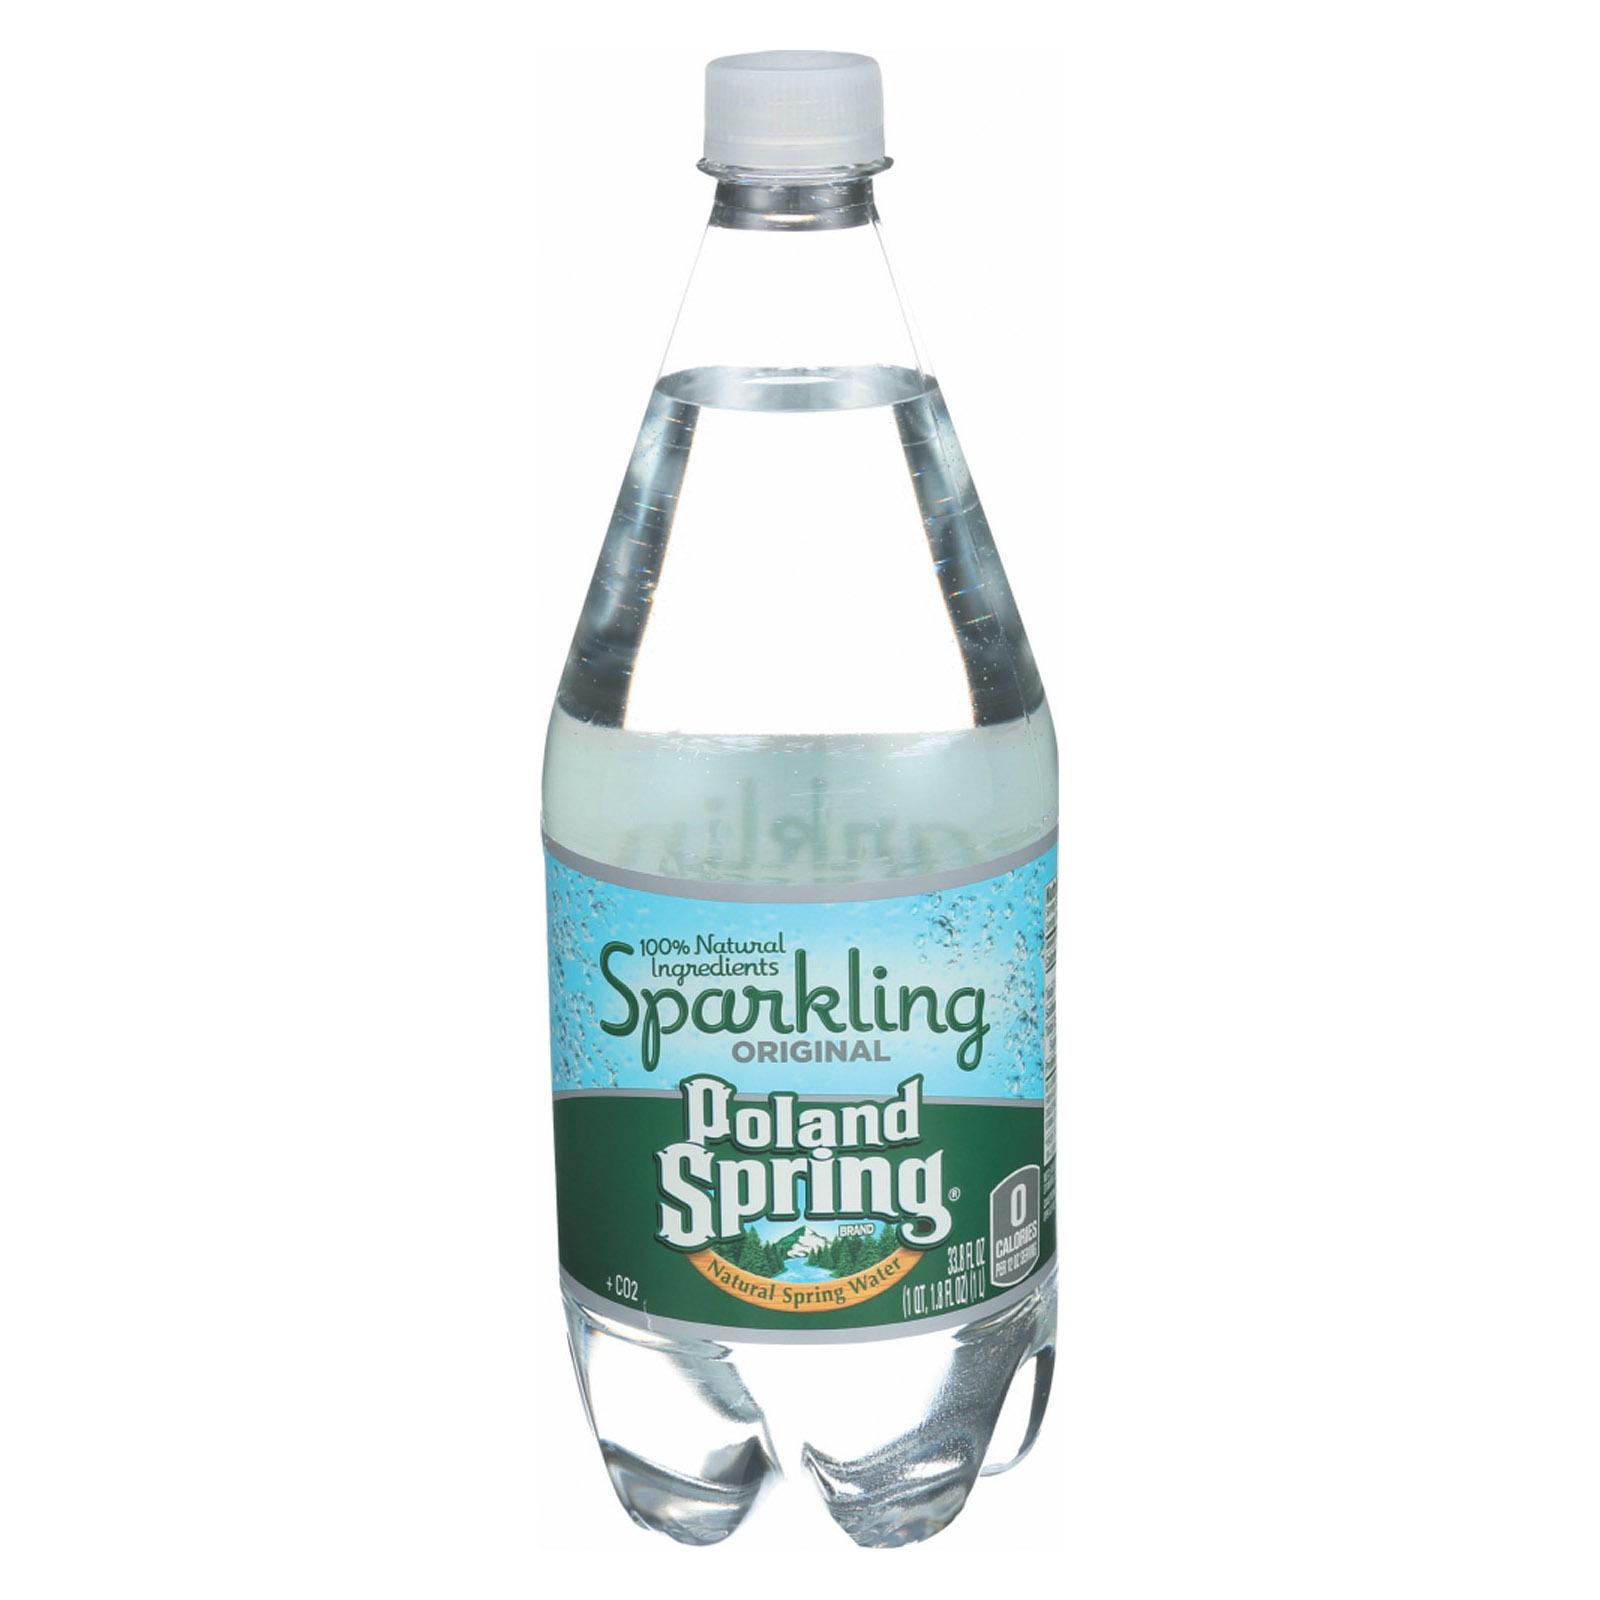 Poland Spring Sparkling Water - Original - Case of 12 - 33.8 Fl oz.